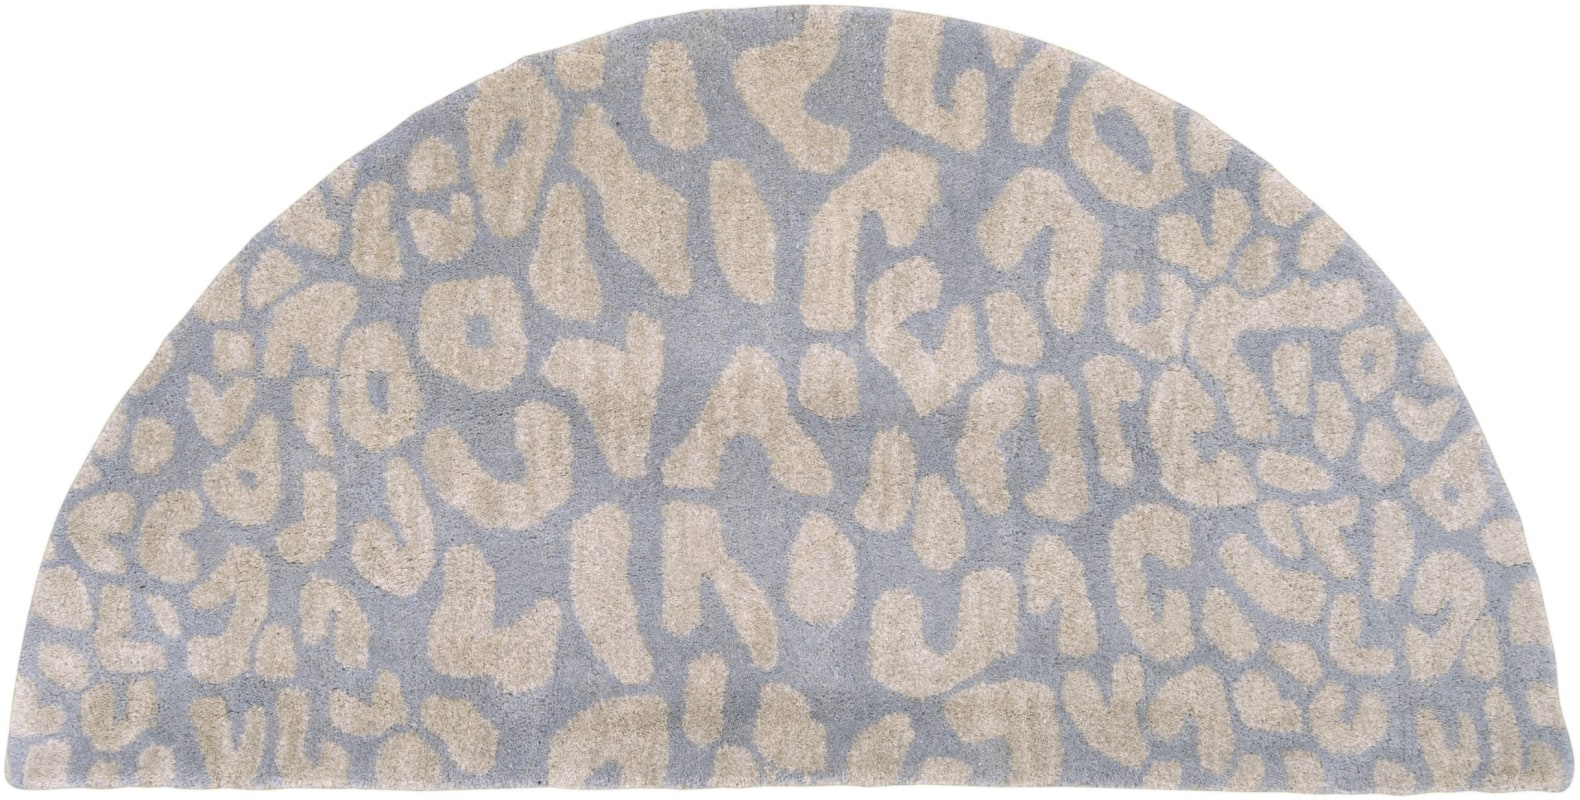 Surya ATH-5001 Athena Hand Tufted Wool Rug Green 9 x 12 Home Decor